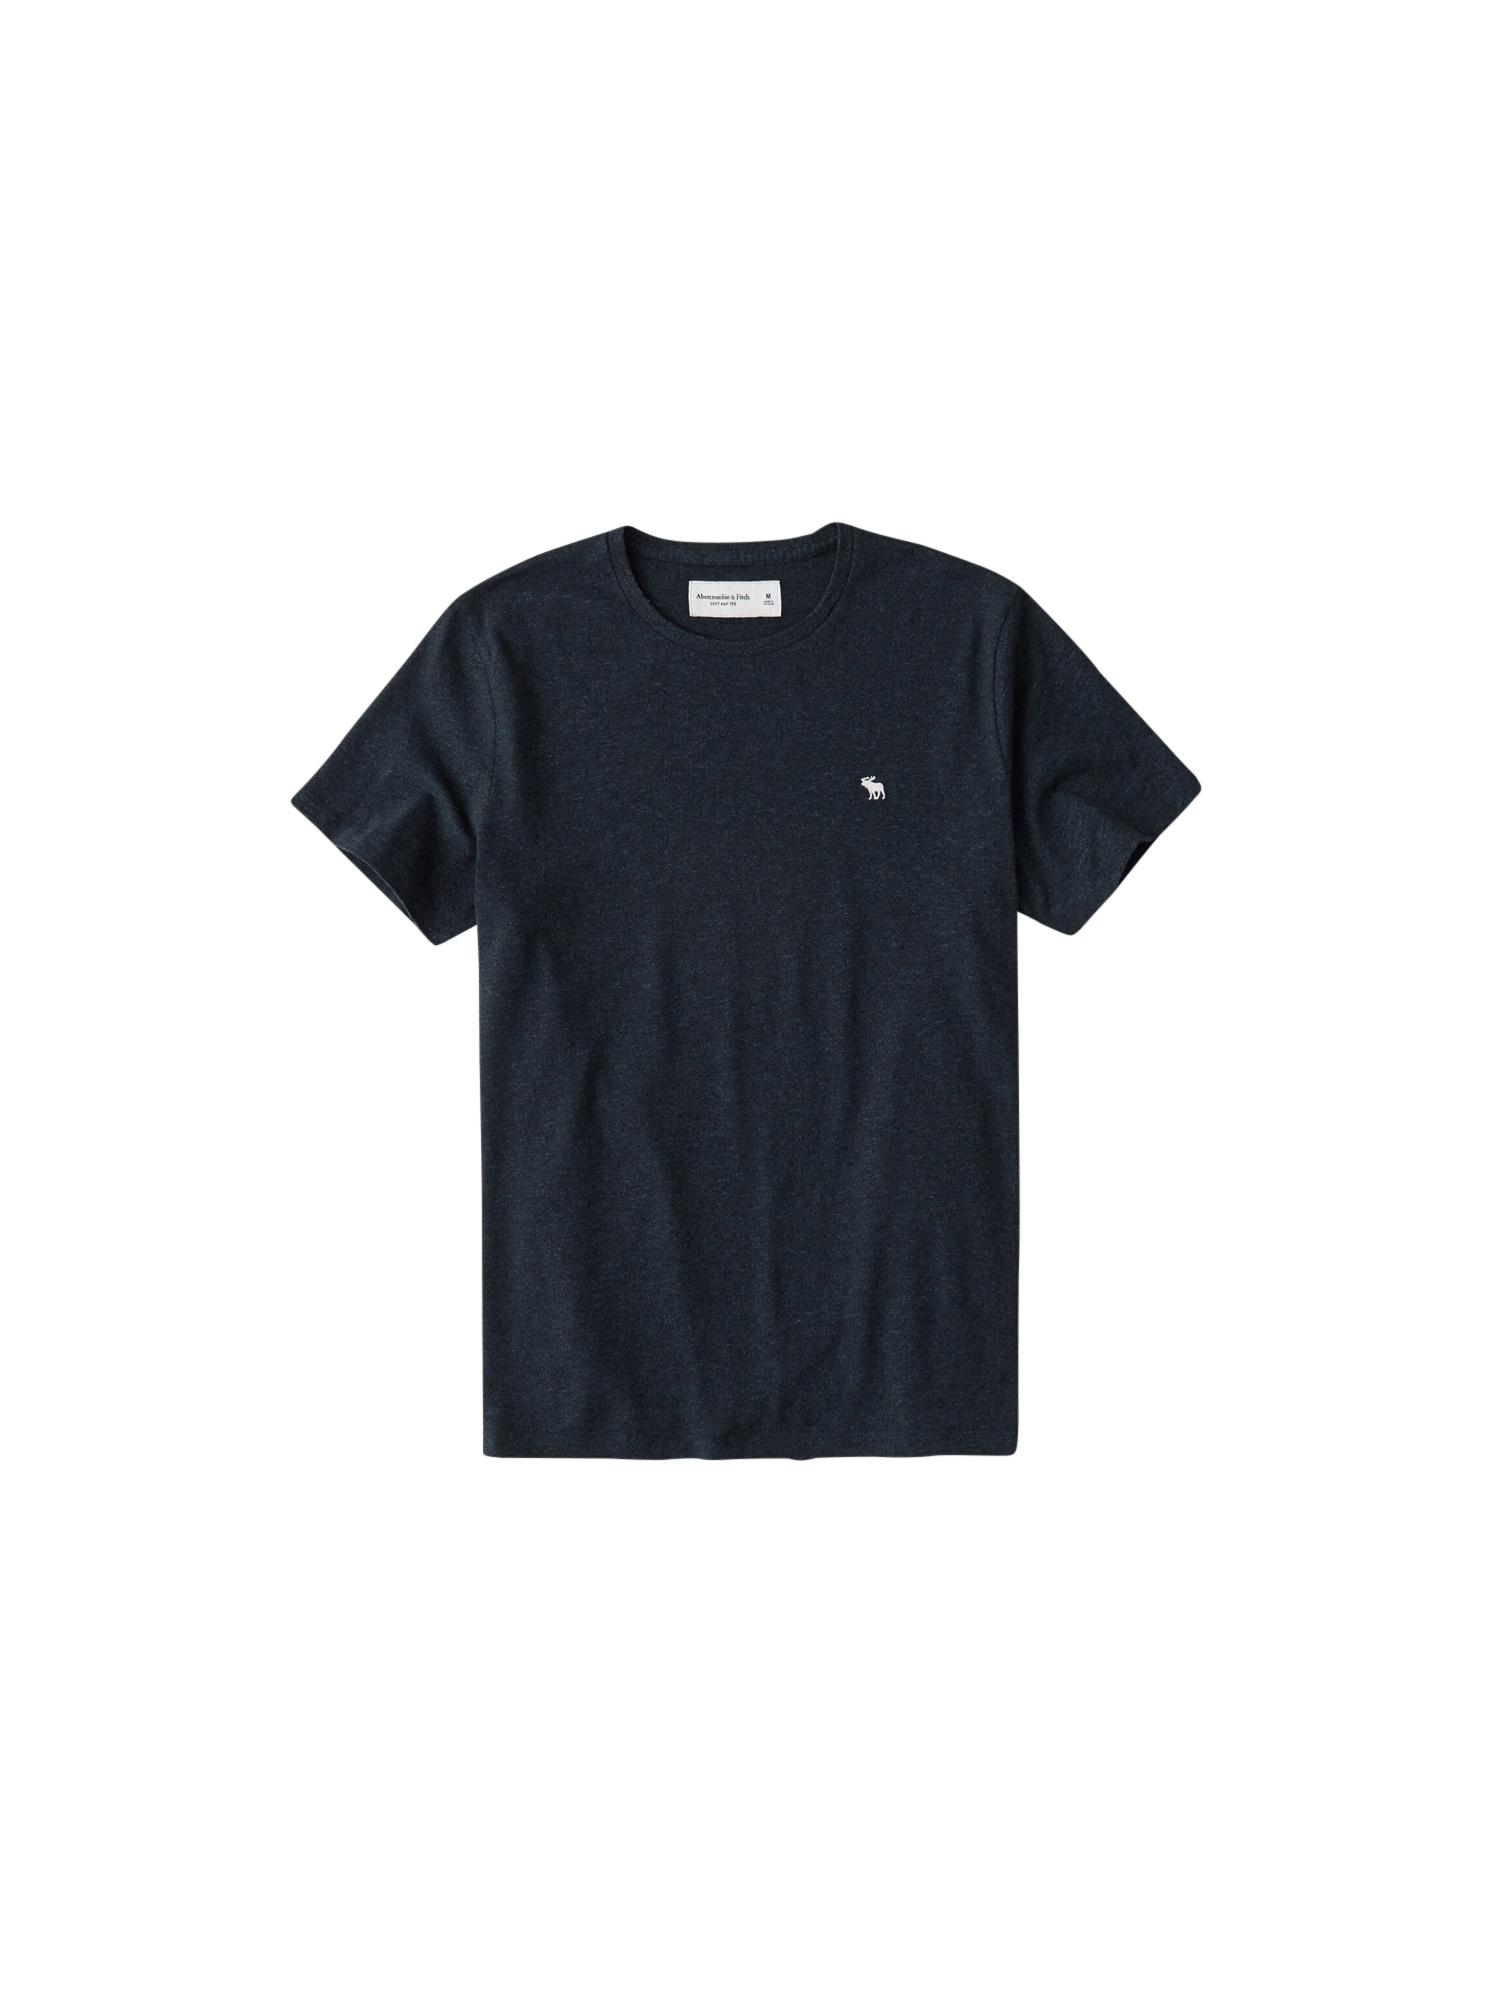 Abercrombie & Fitch Marškinėliai tamsiai mėlyna